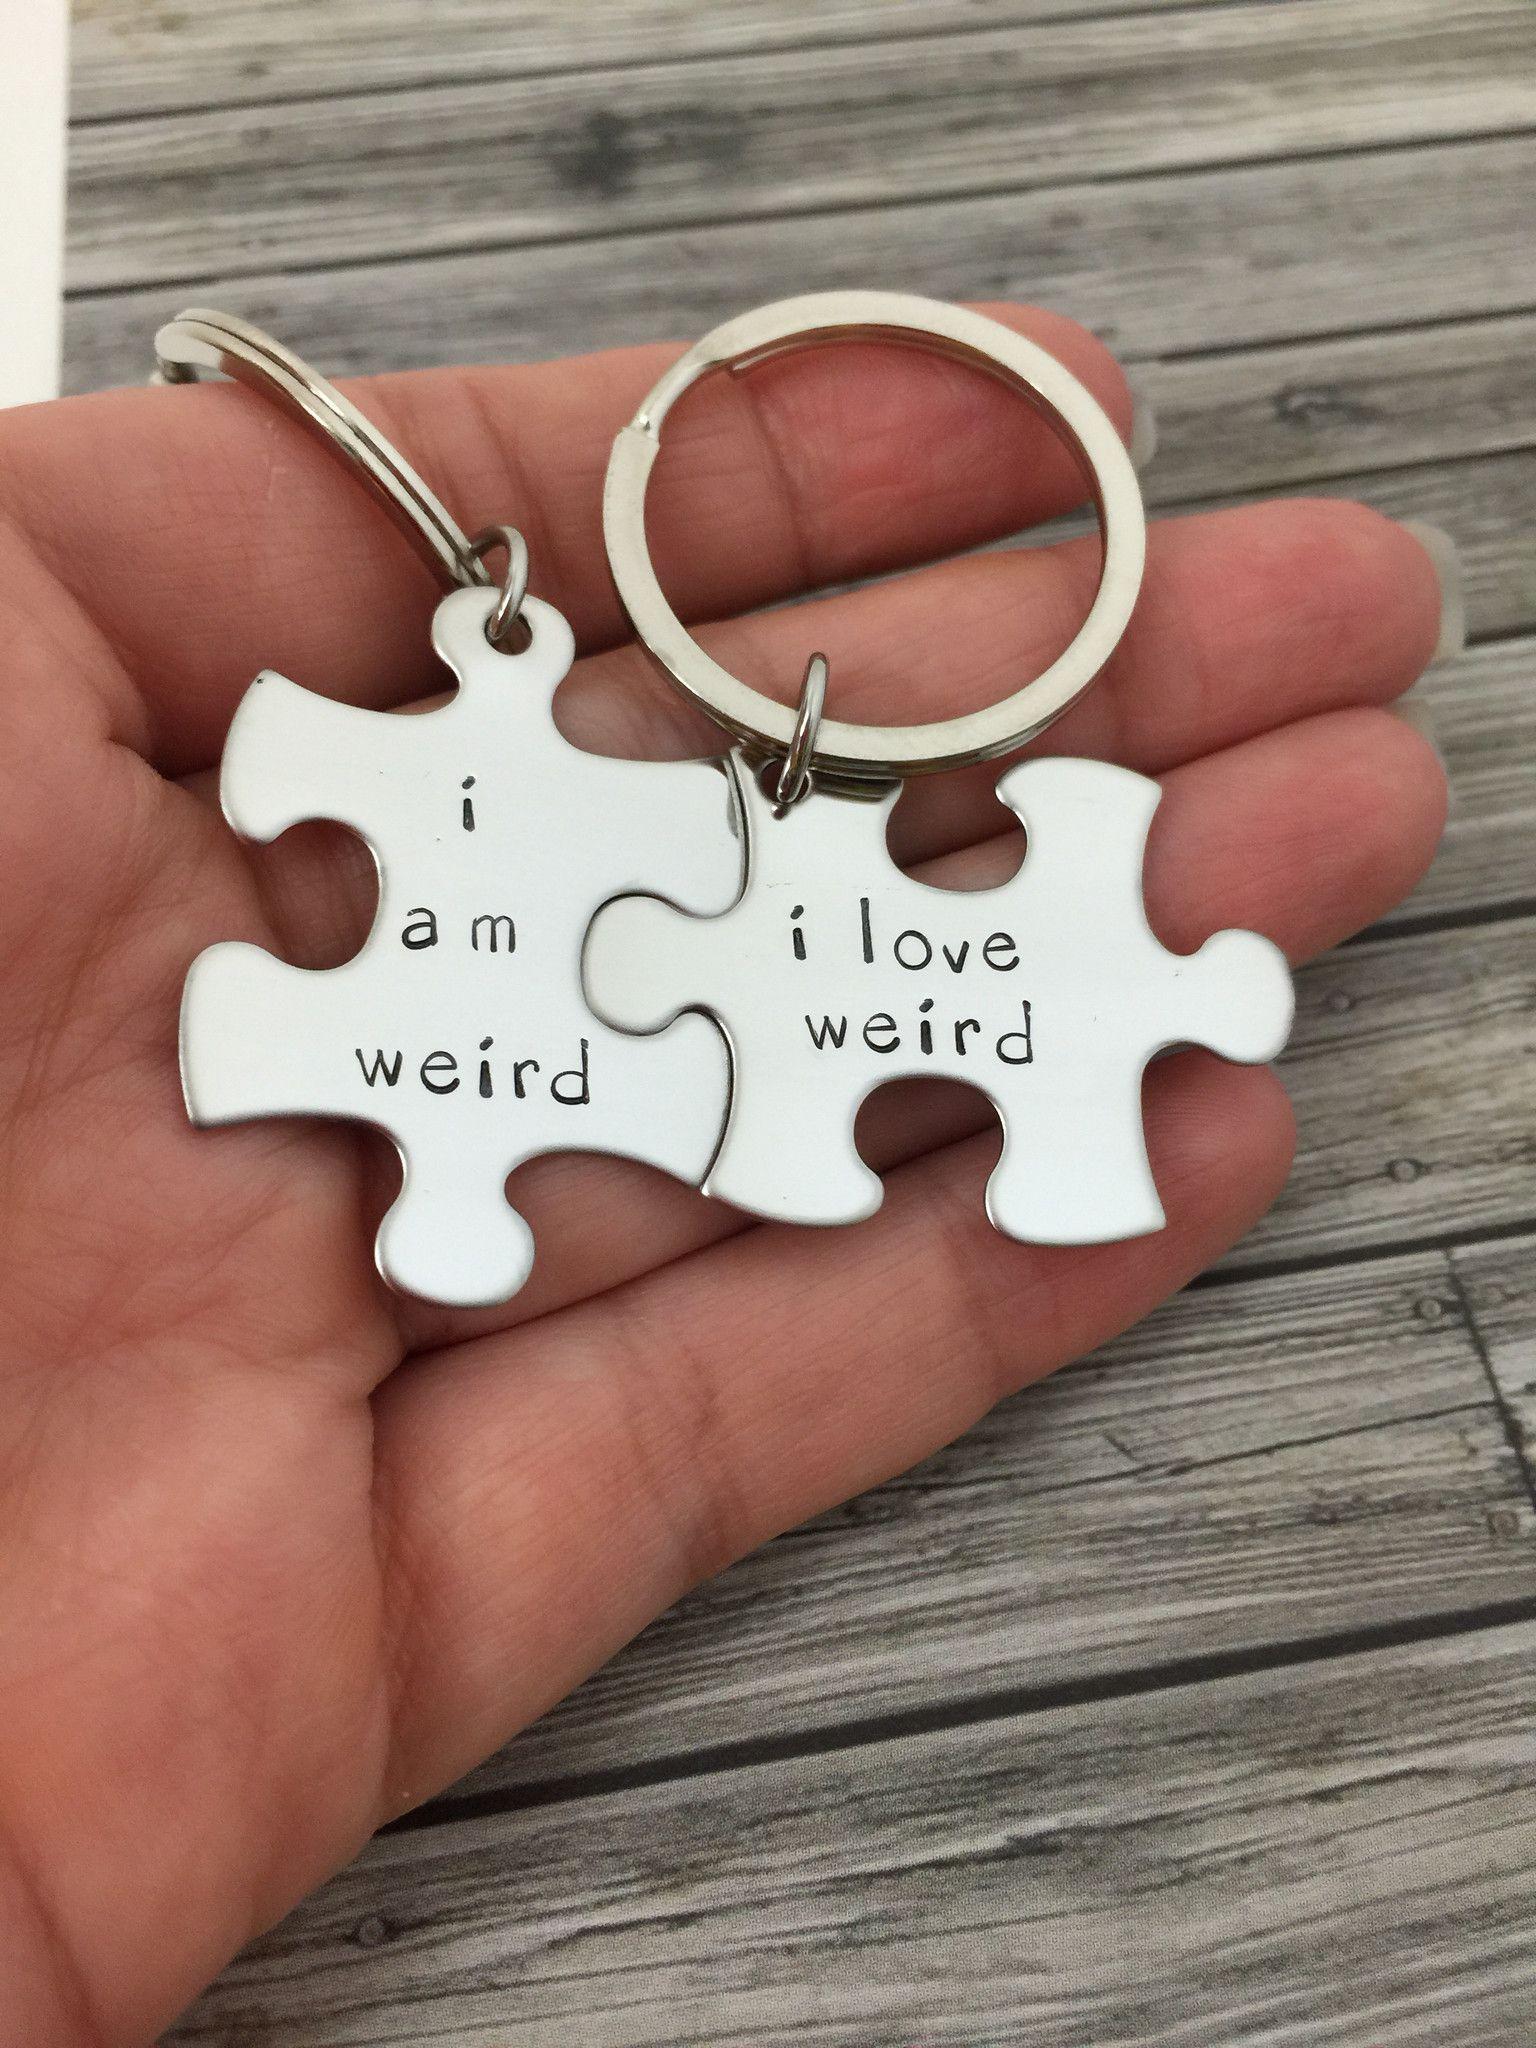 Couples Gag Gift Ideas  I am weird I love weird Couples Keychains Couples Gift